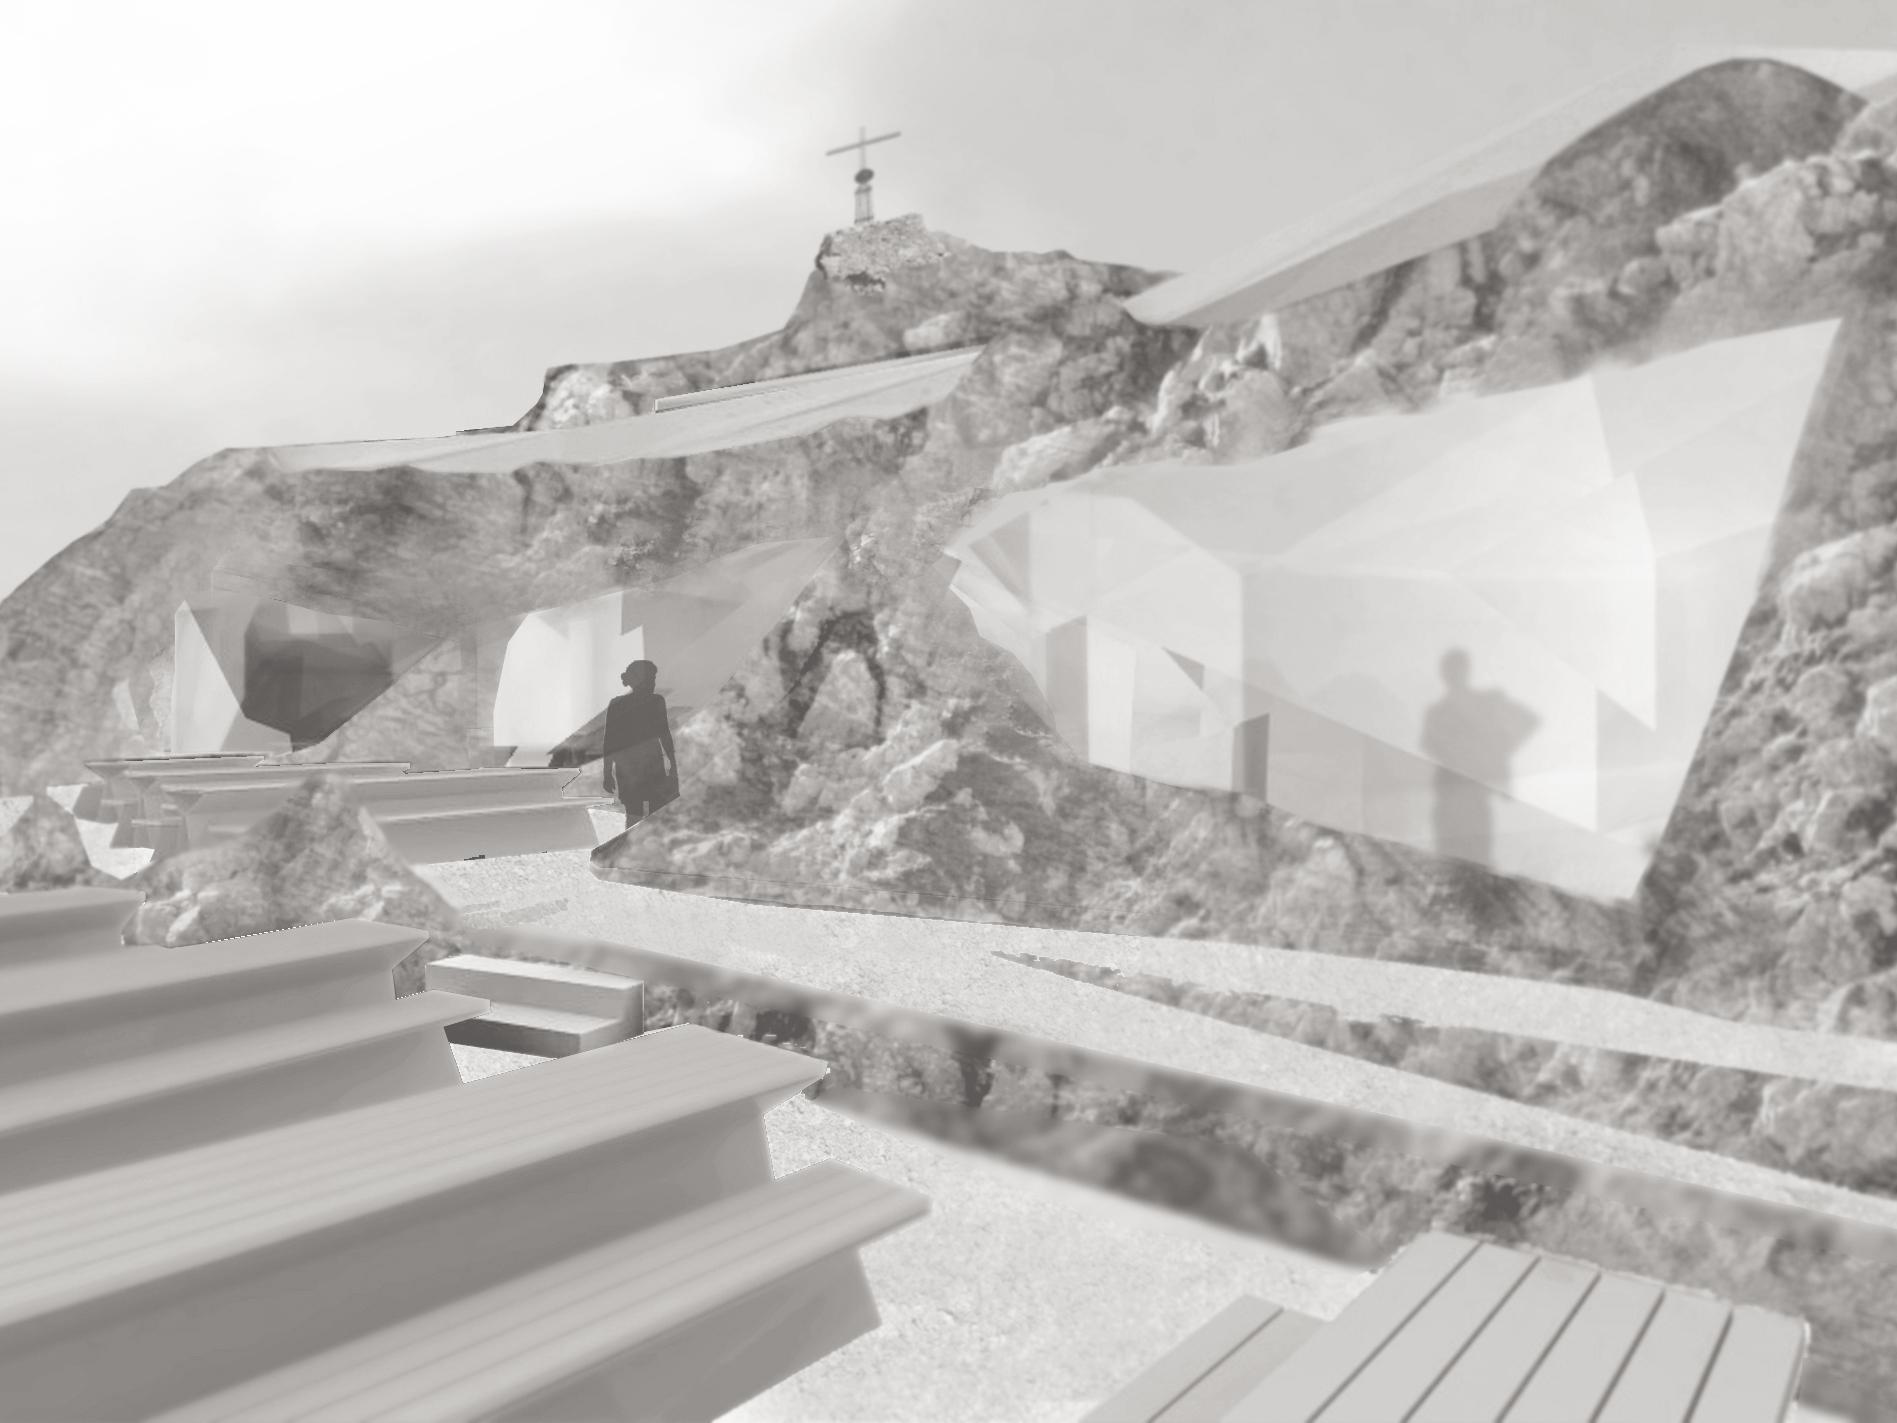 Michael-Becker-Architects-Architekten-Gipfelstation-Nebelhorn-Perspektive-K02